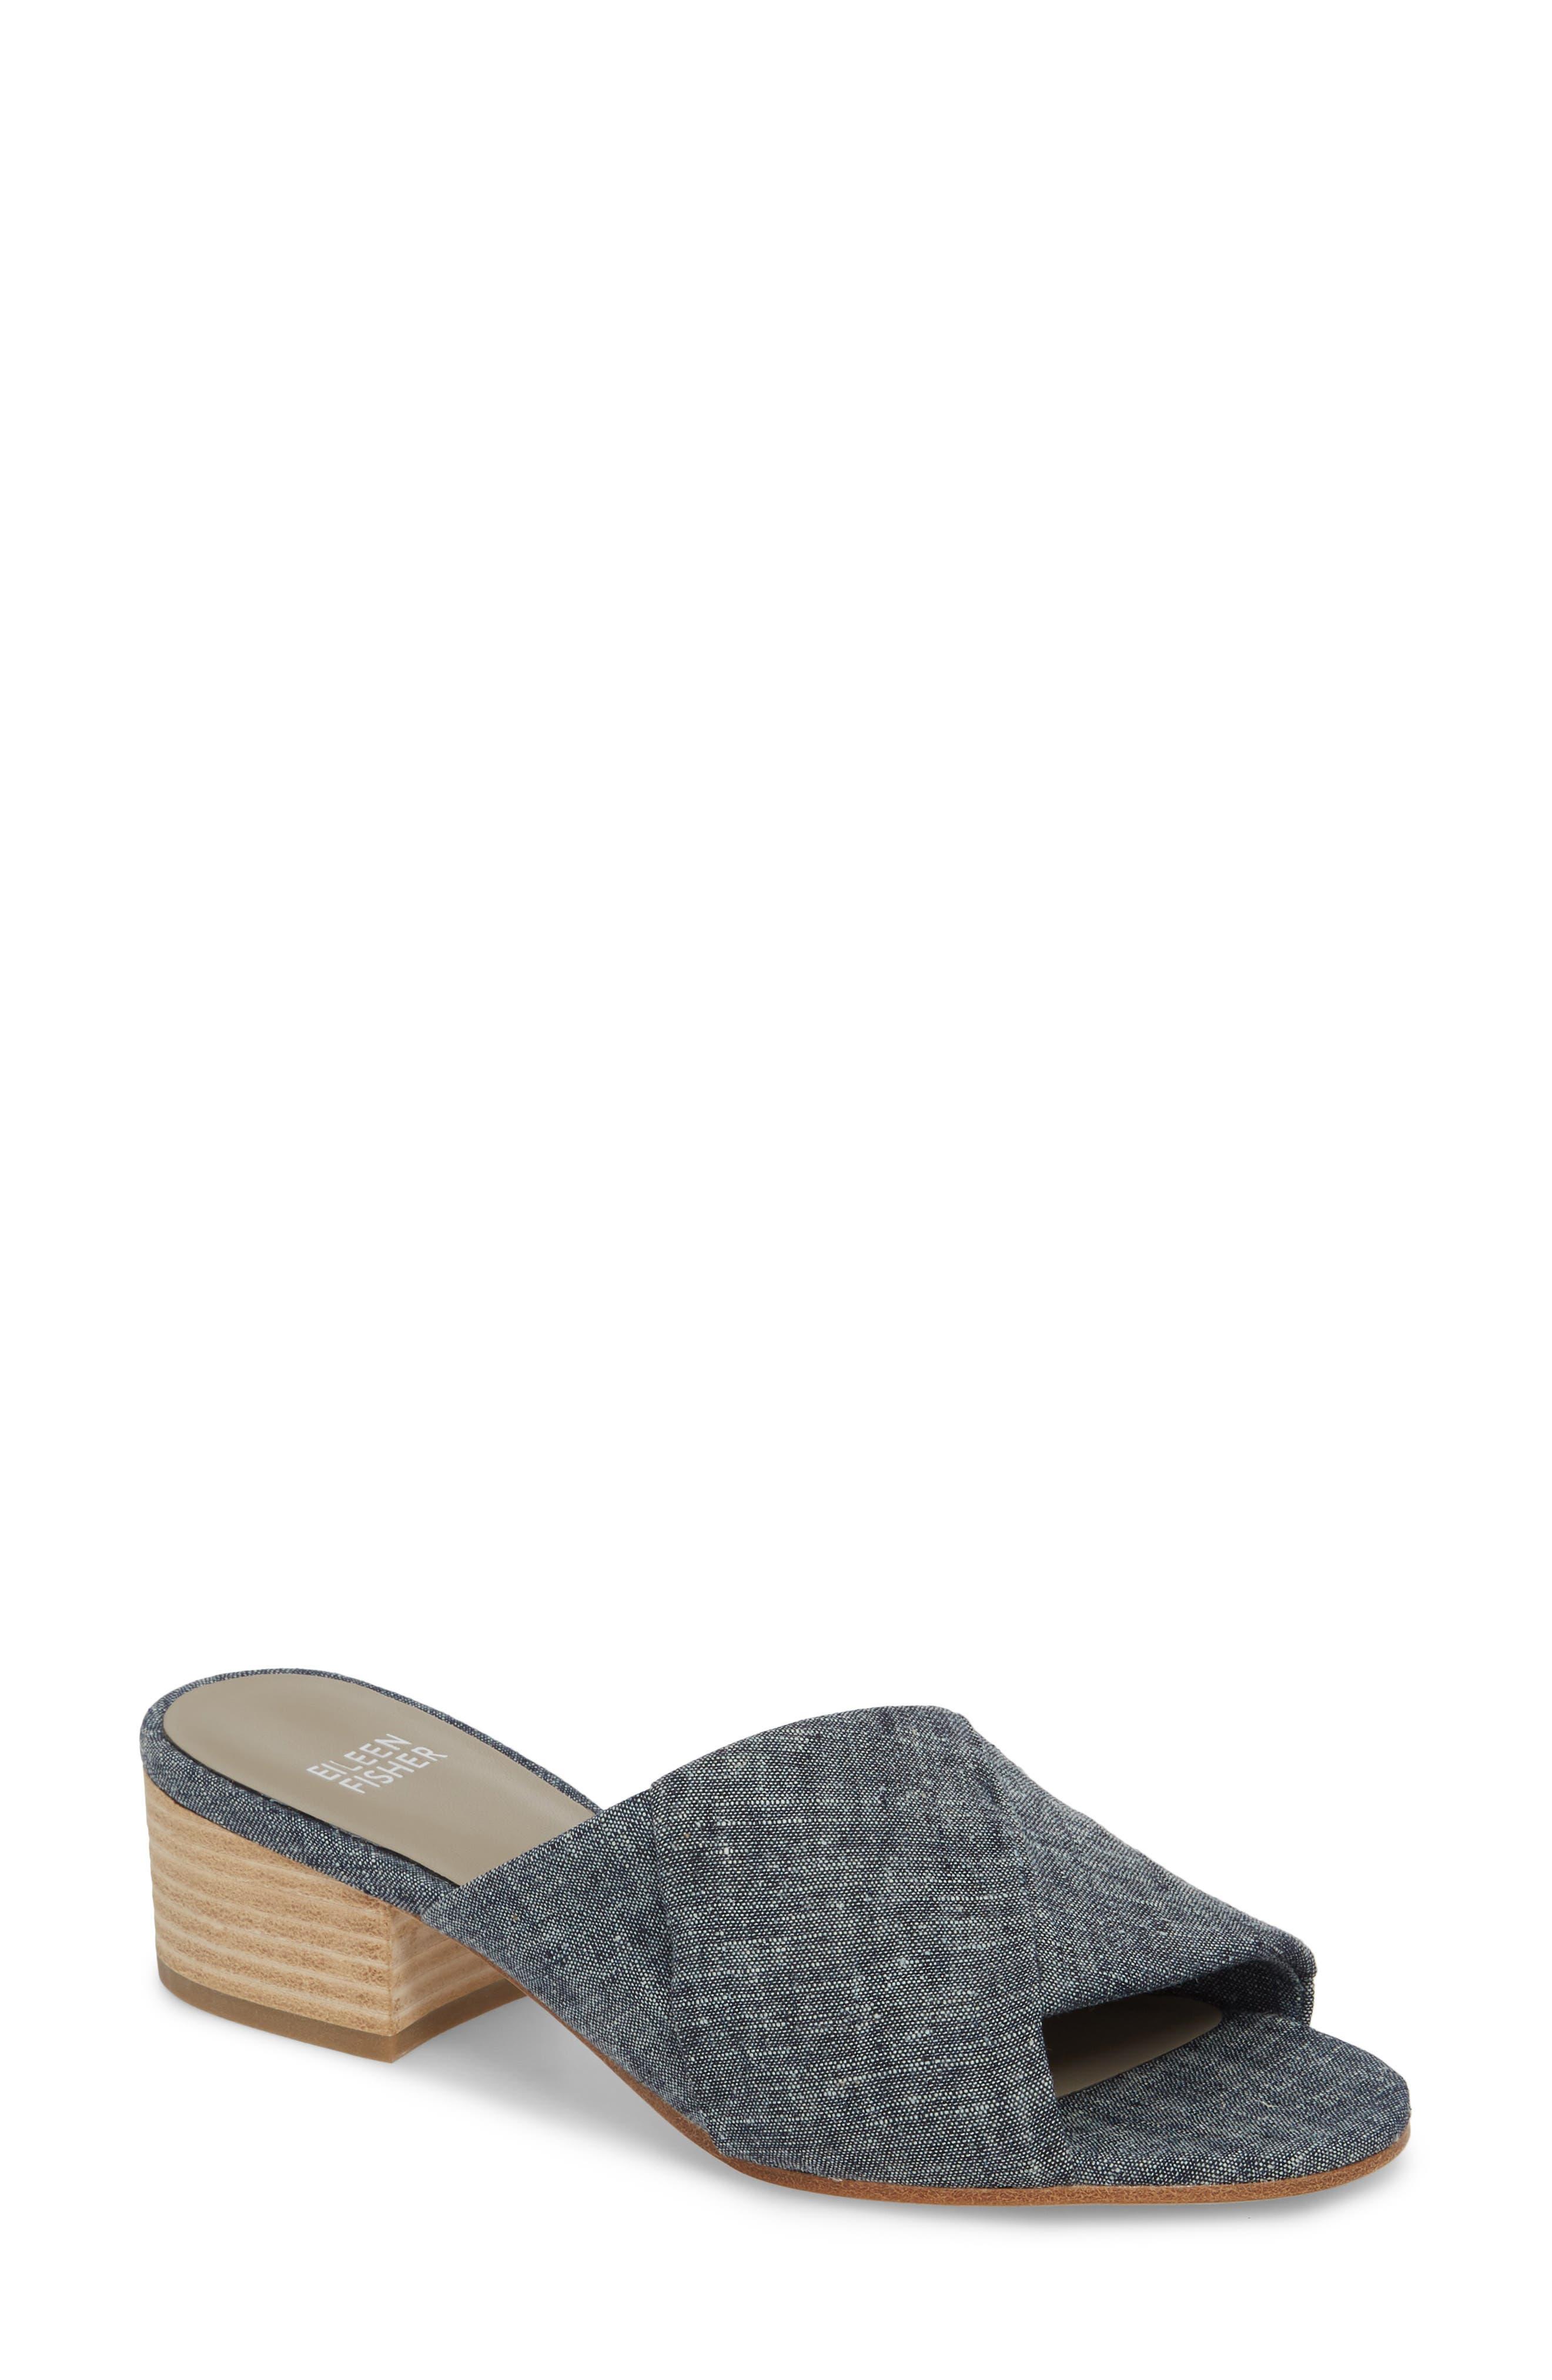 Ruche Sandal,                         Main,                         color, Denim Fabric